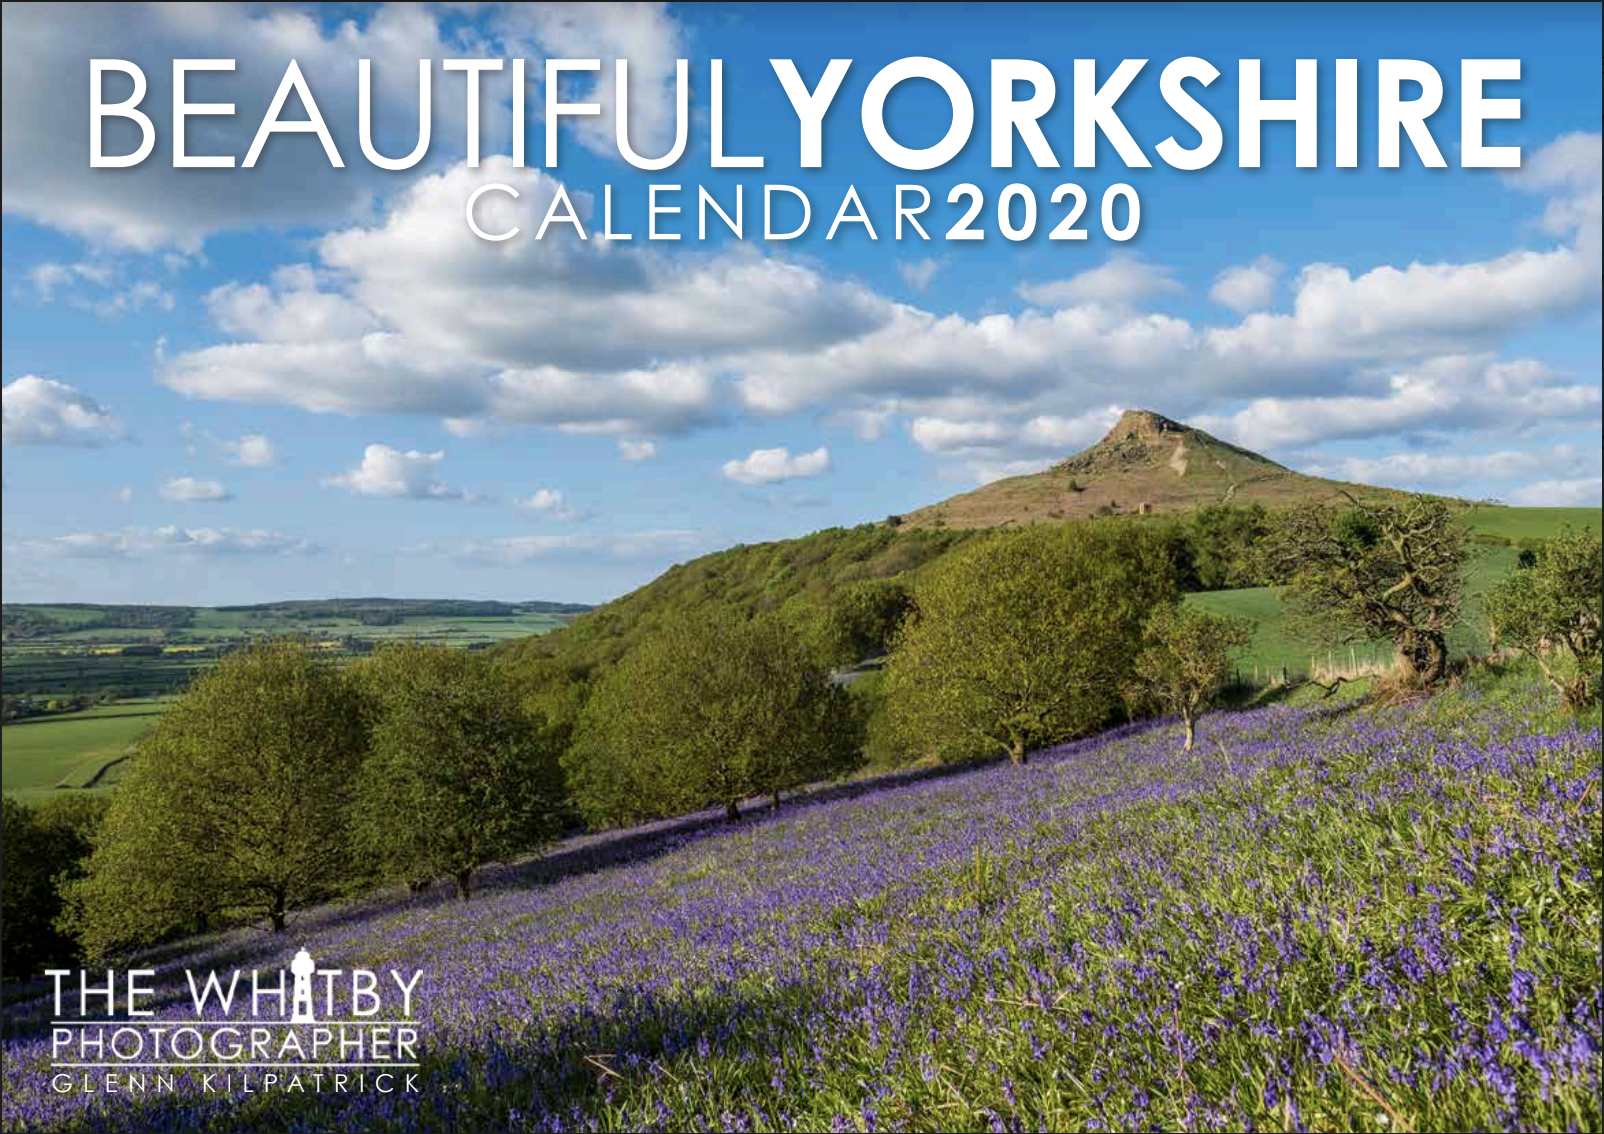 The Beautiful Yorkshire Calendar 2020